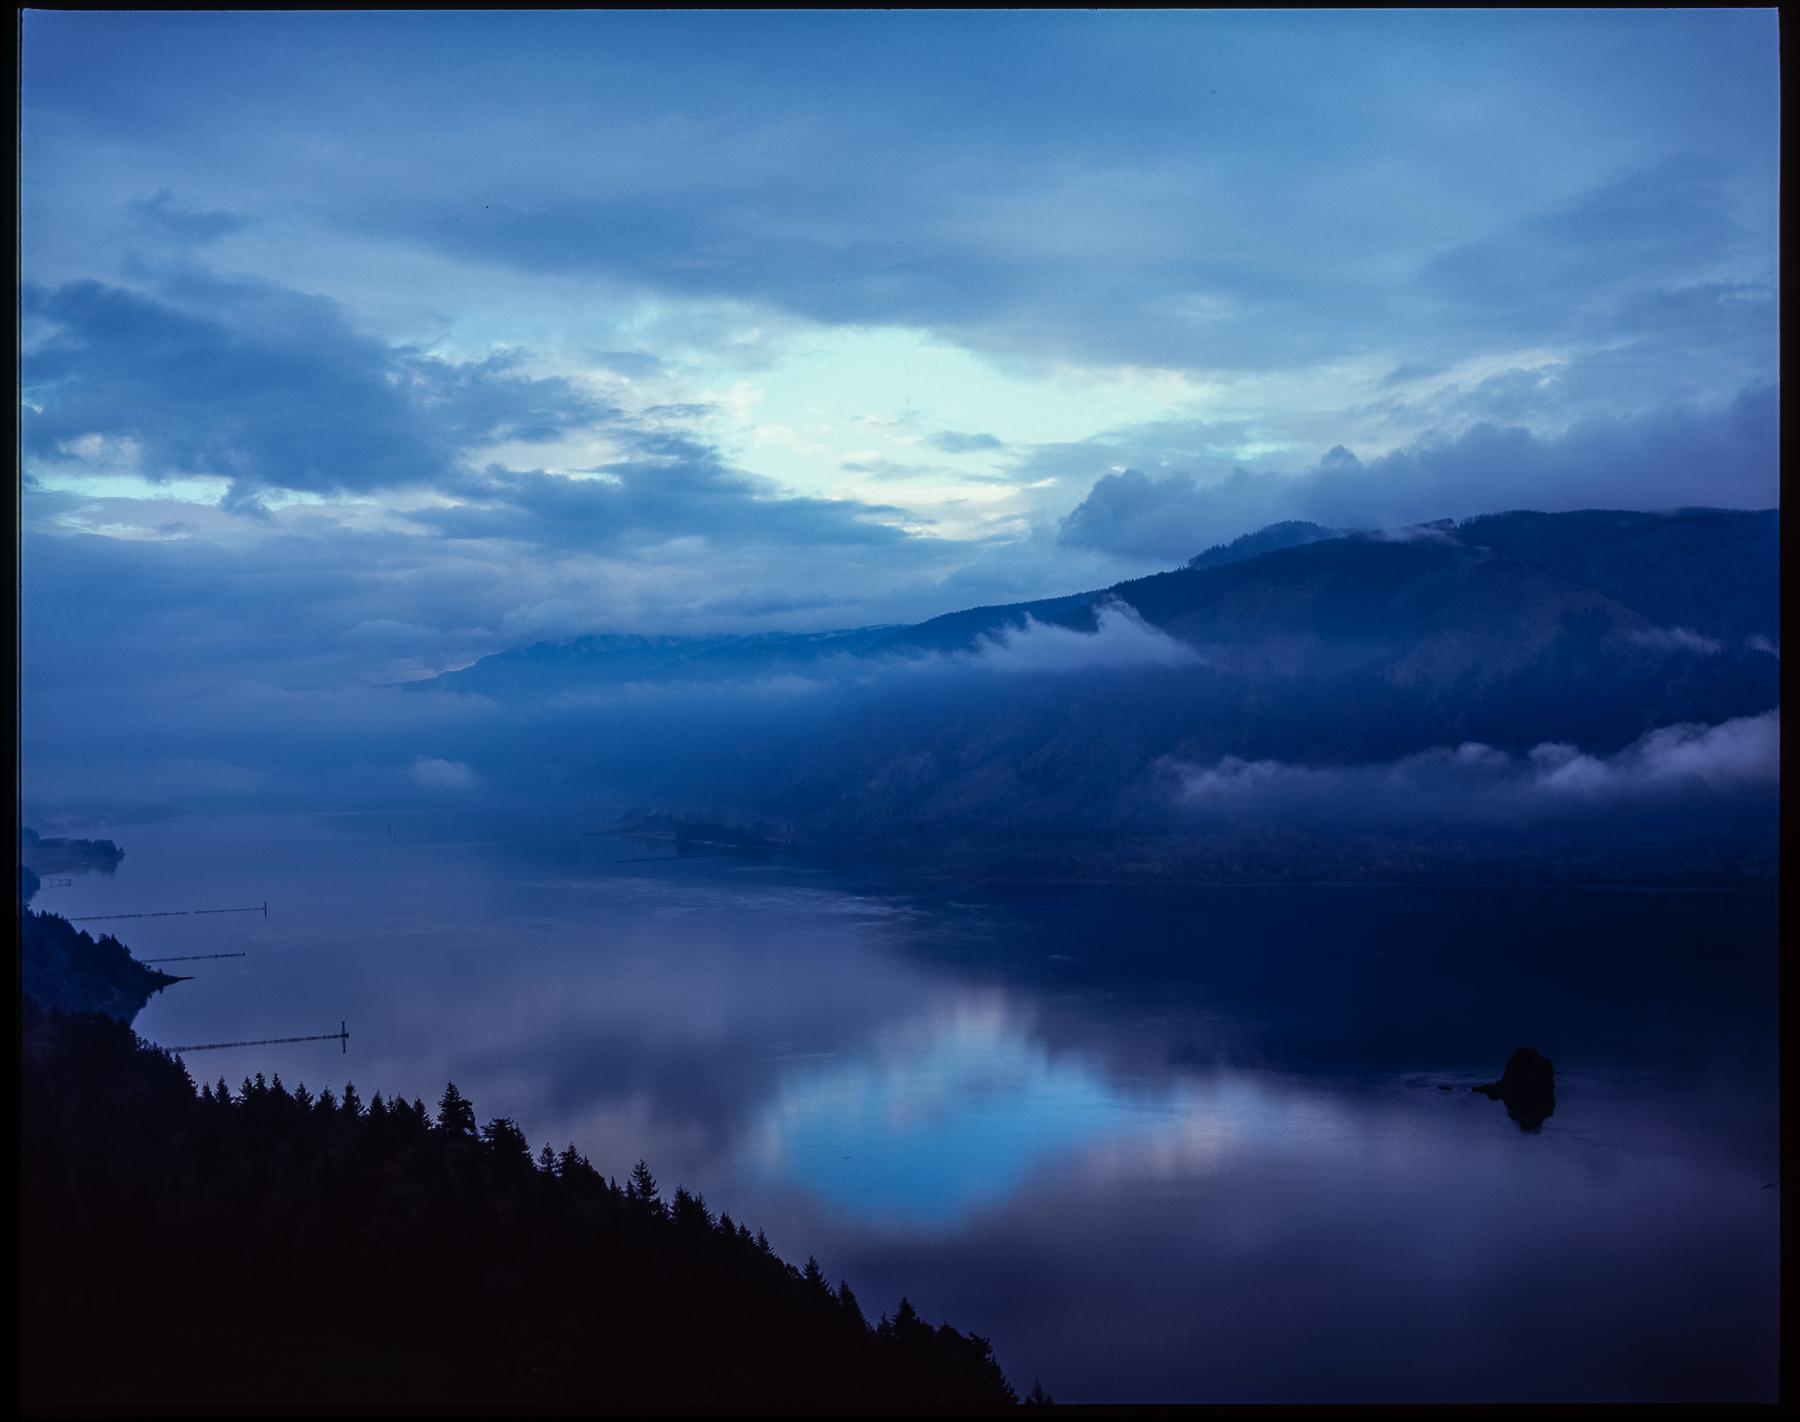 Gorge Of Silence | Pentax 6x7 90mm 2.8 | Kevin Rosinbum